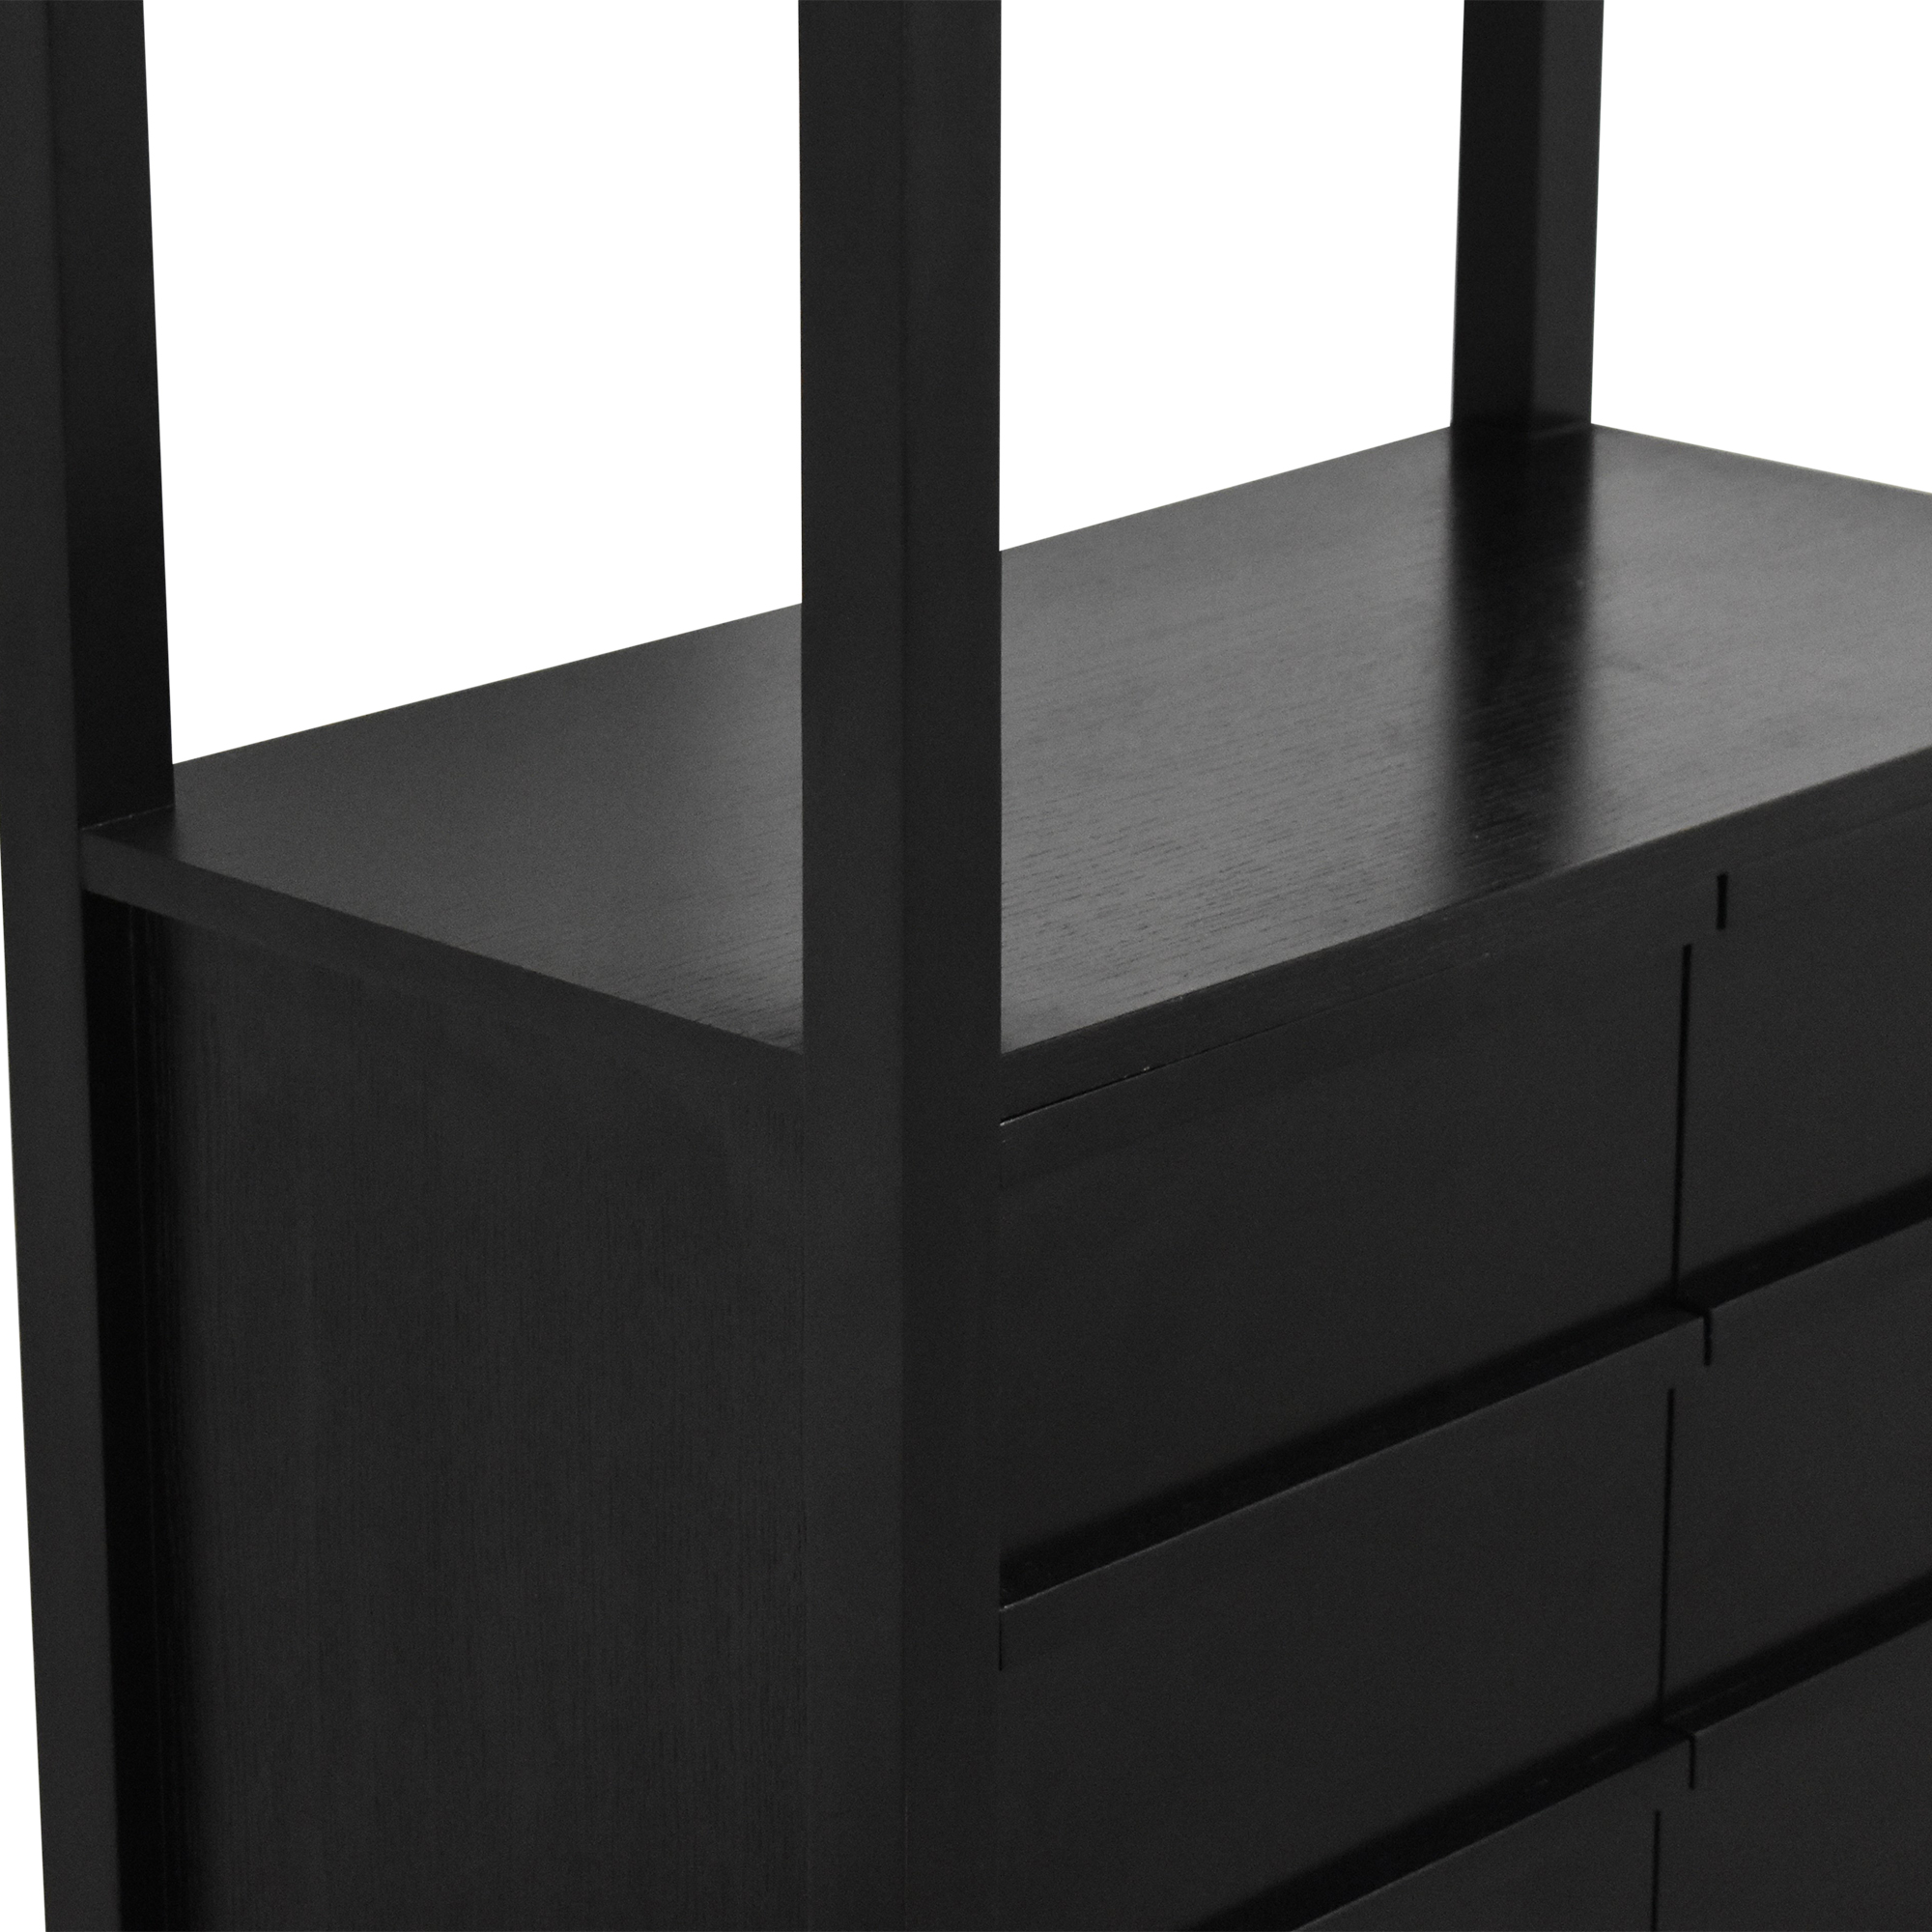 Crate & Barrel Crate & Barrel Spotlight Bookcase for sale